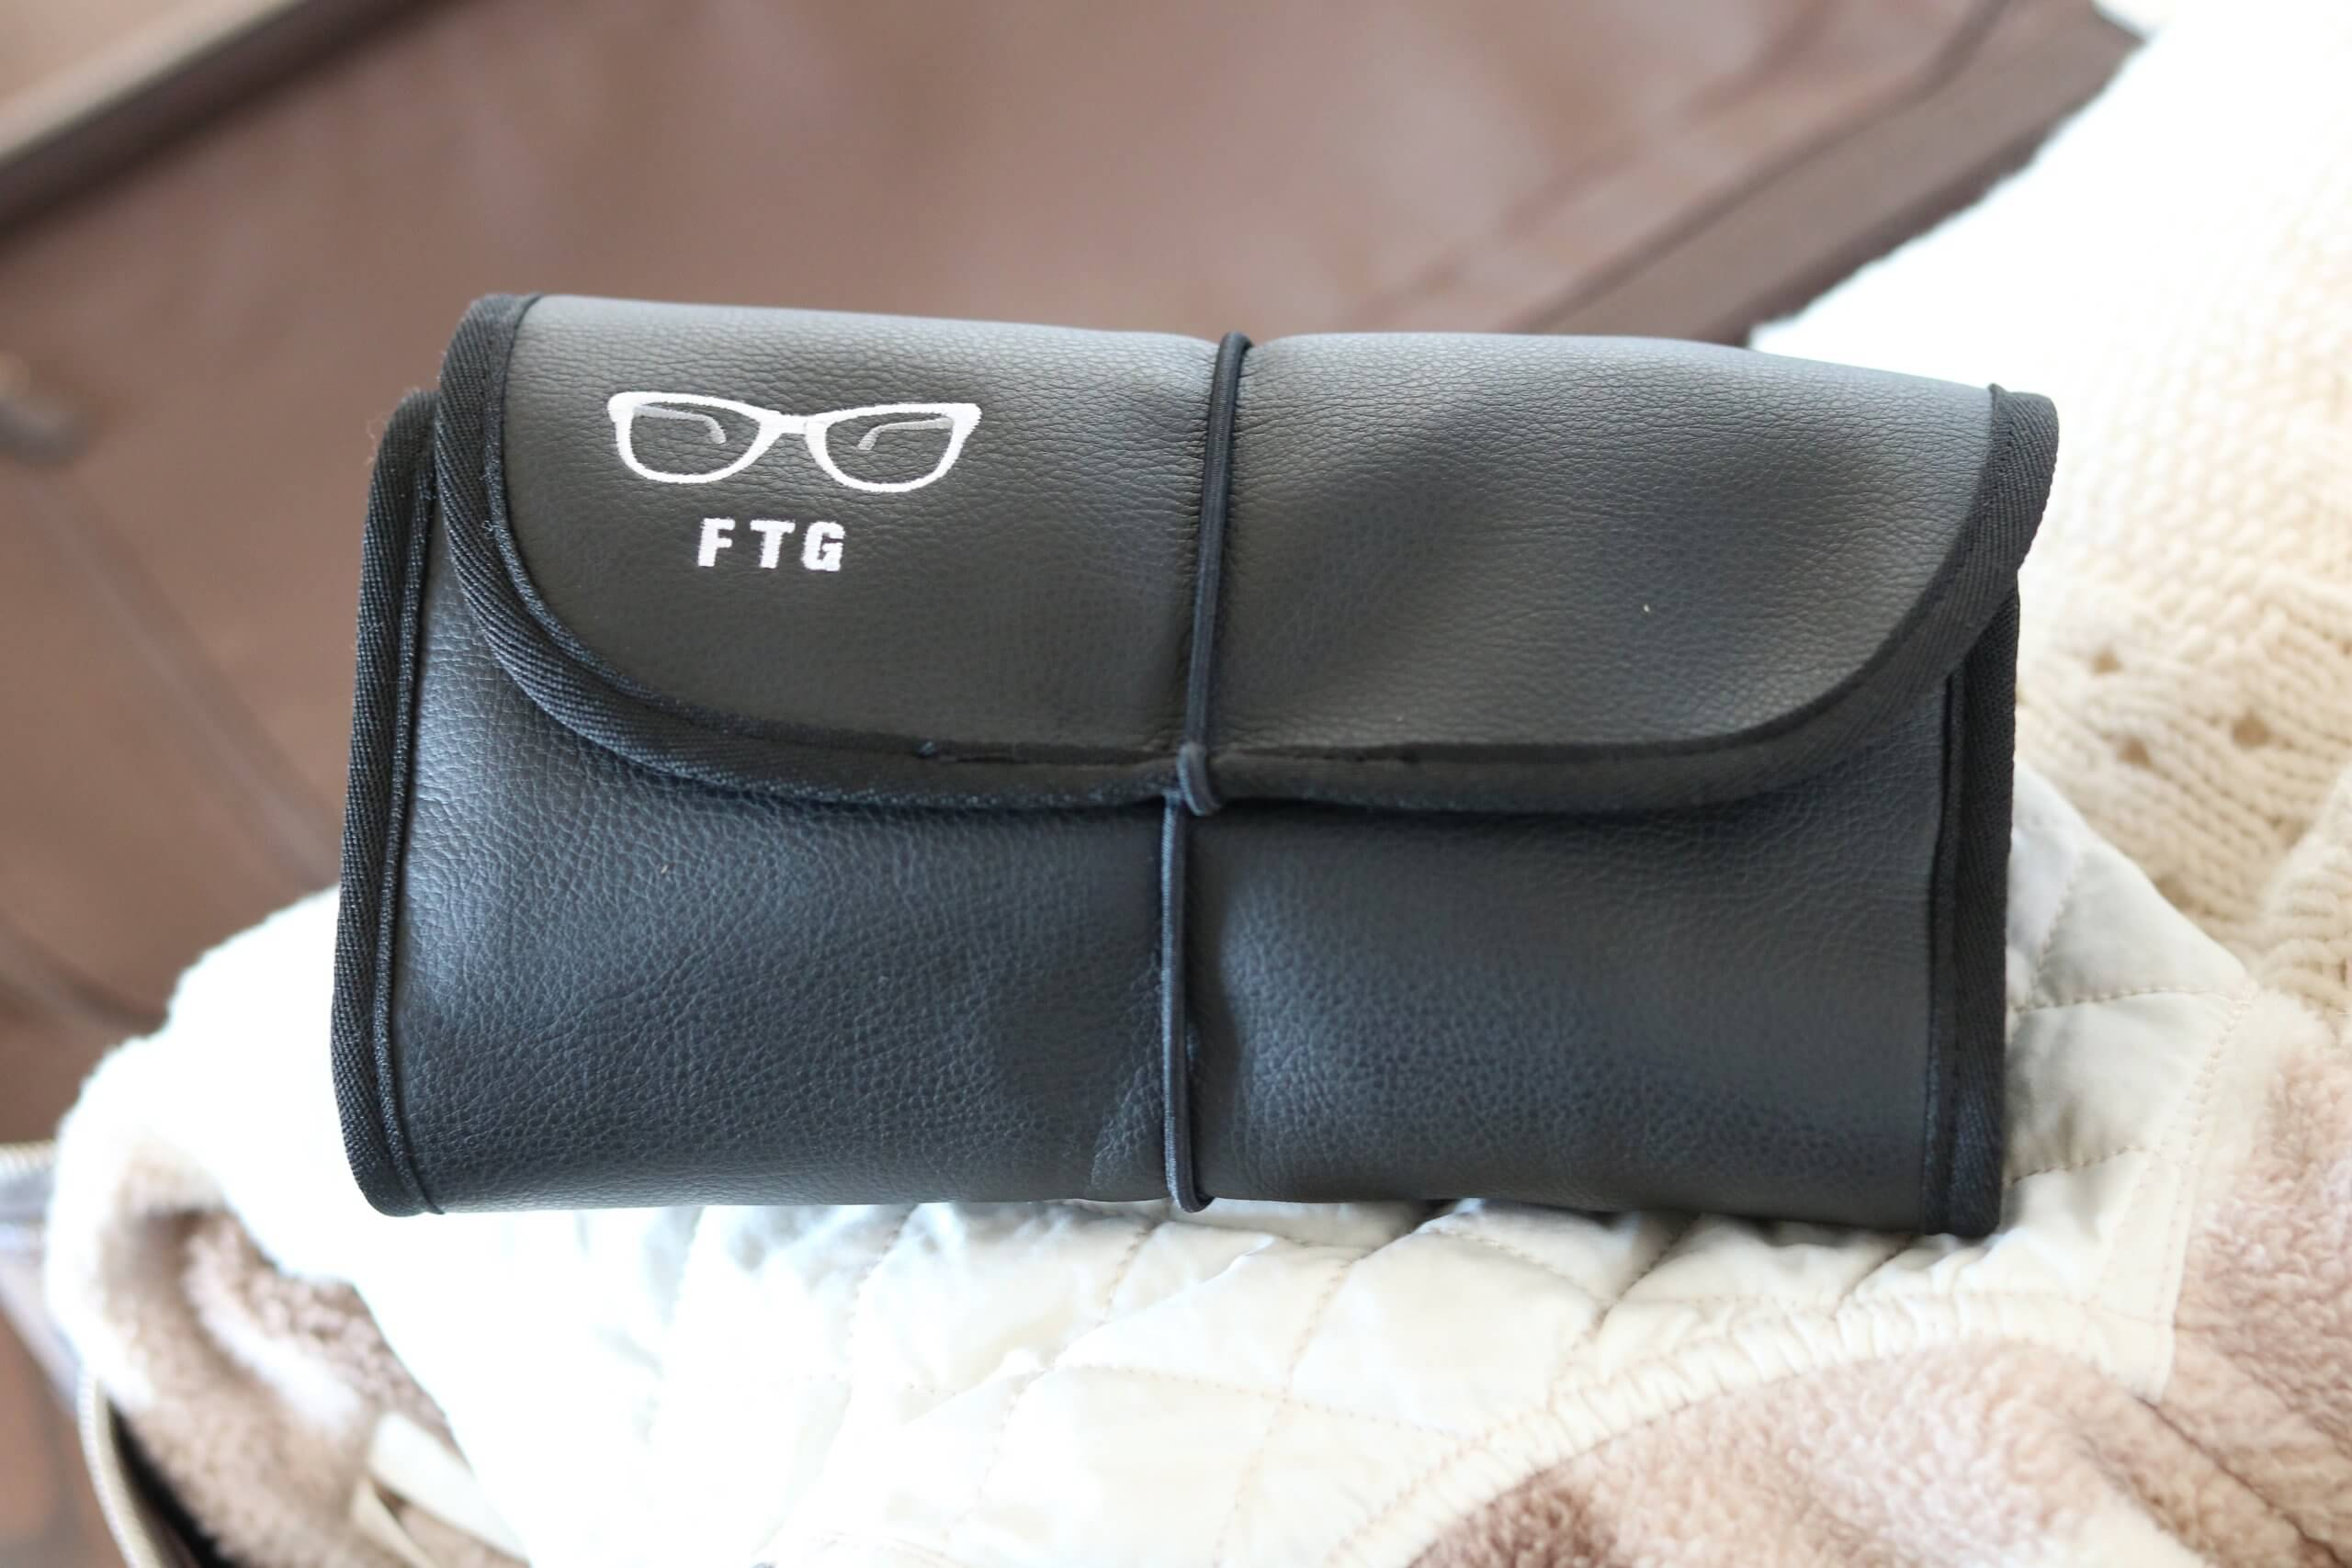 The Original FTG (Frames2go!) Review Inspired by Rossland Optical